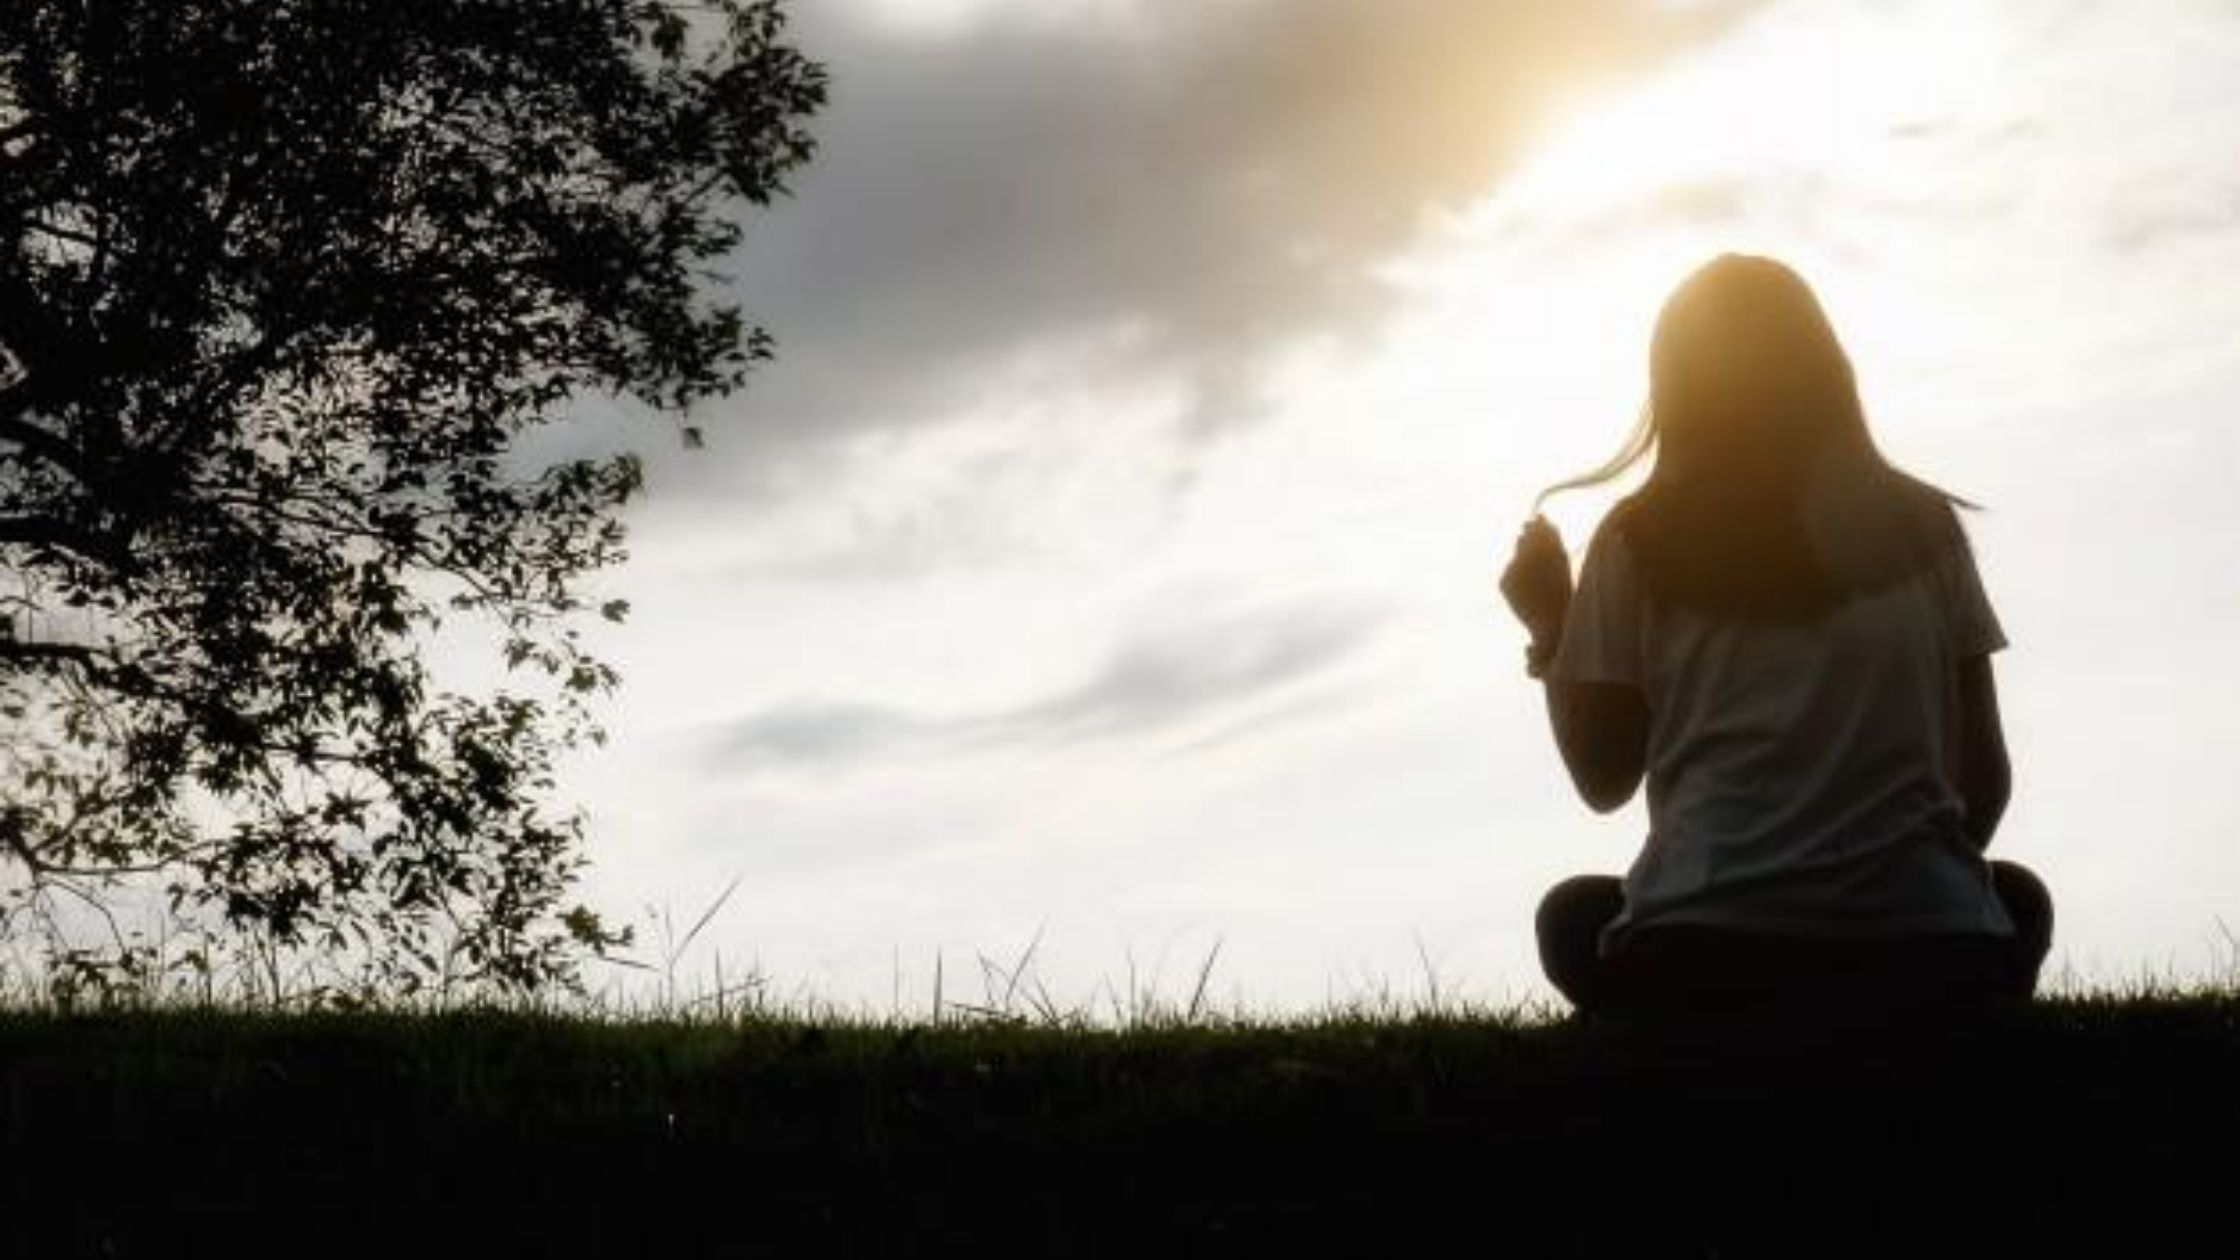 50 Deep Poems About Love and Pain by Meghana Dumpala